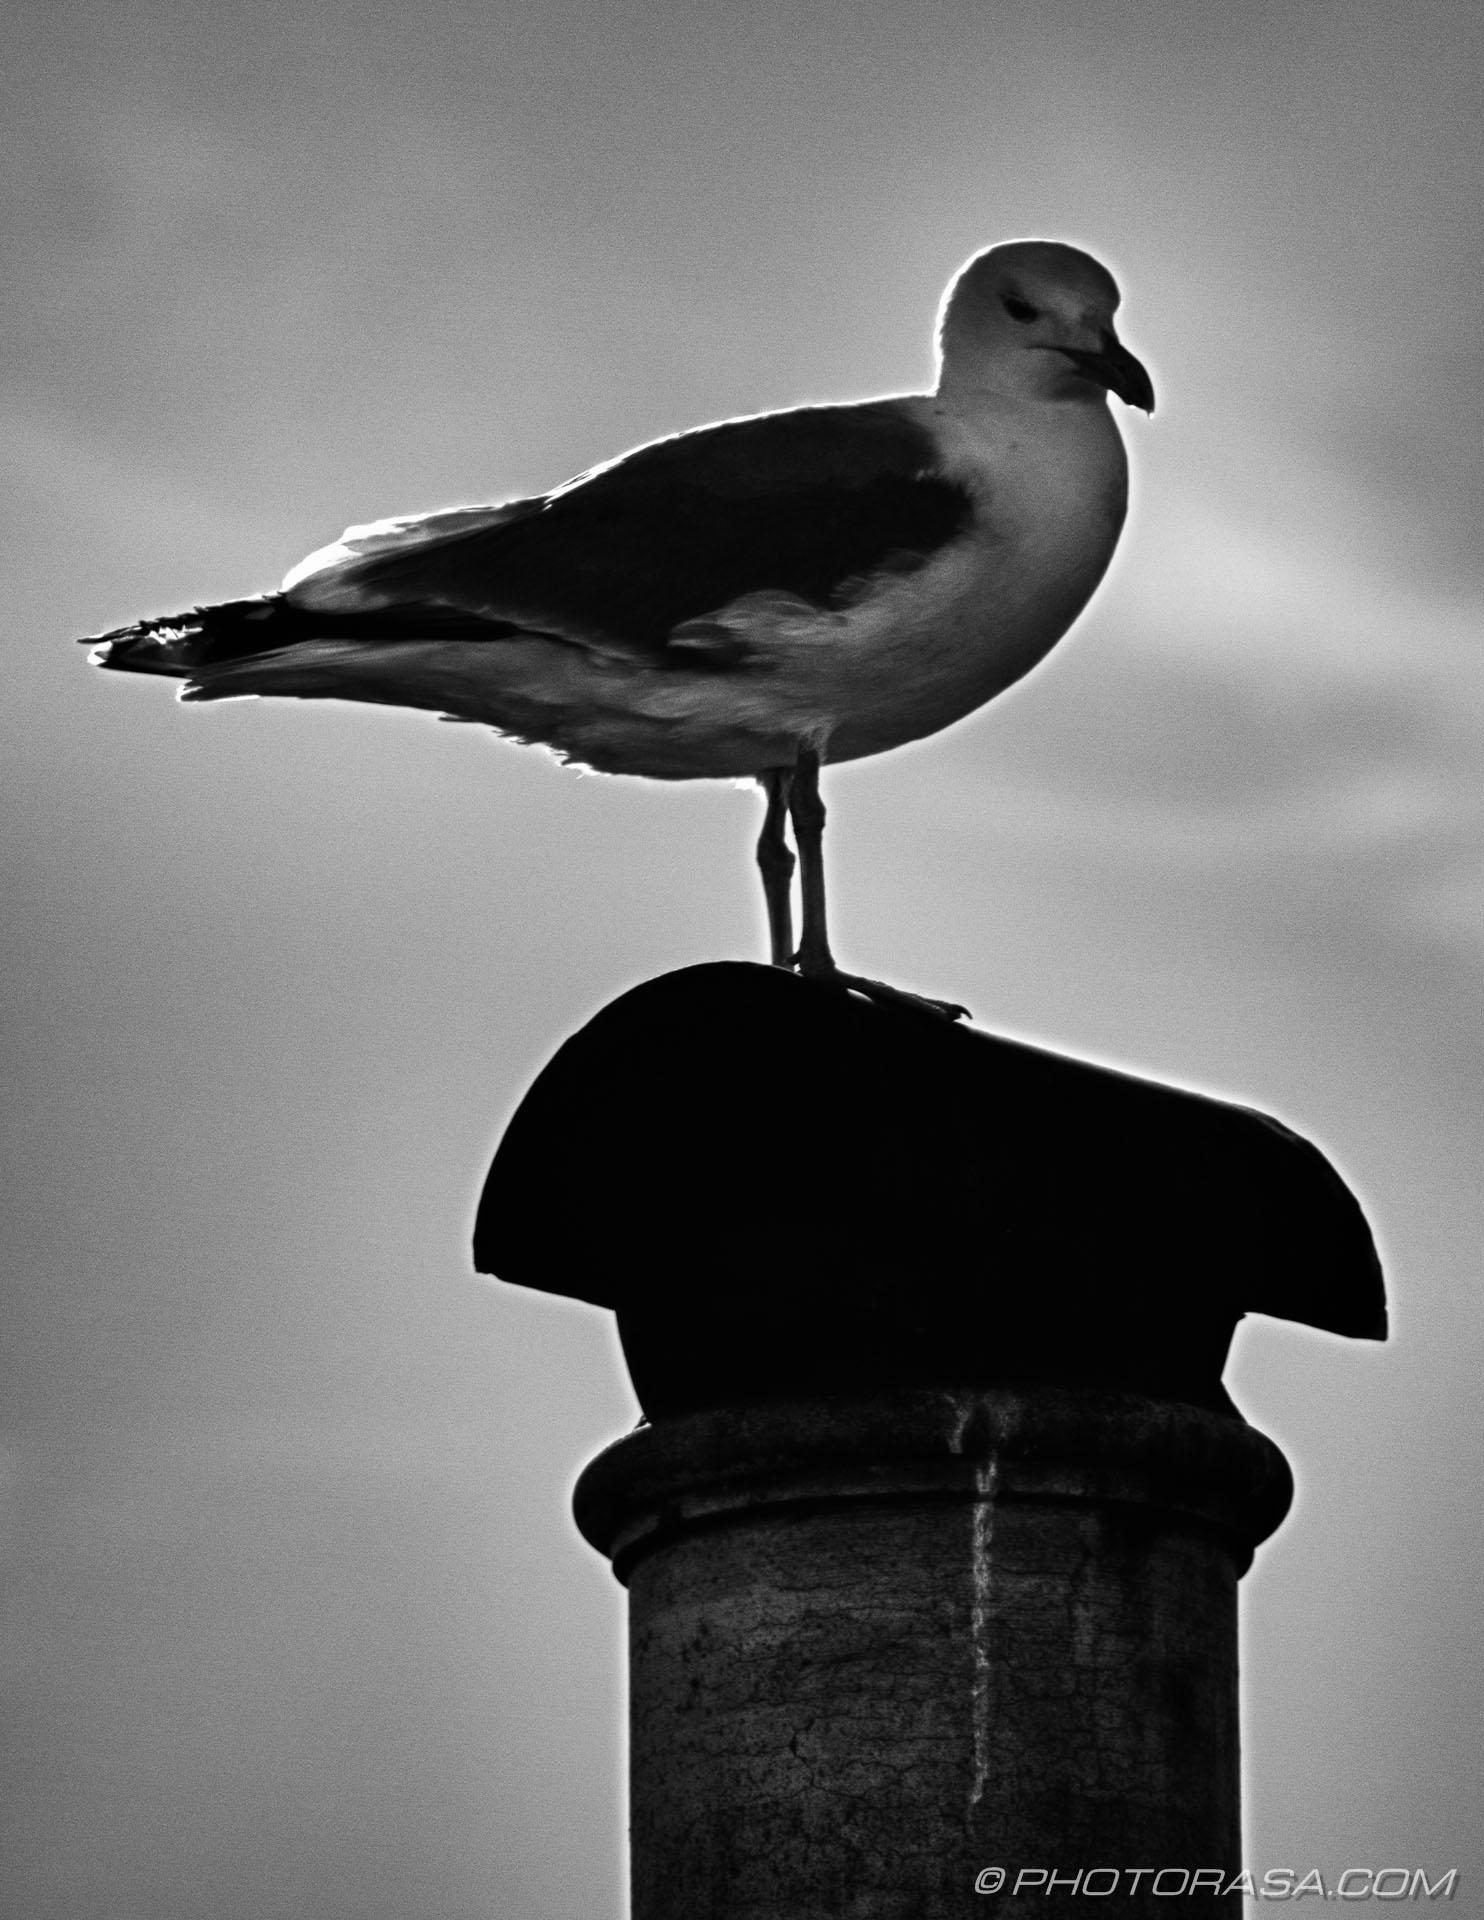 https://photorasa.com/seagulls/backlit-seagull/